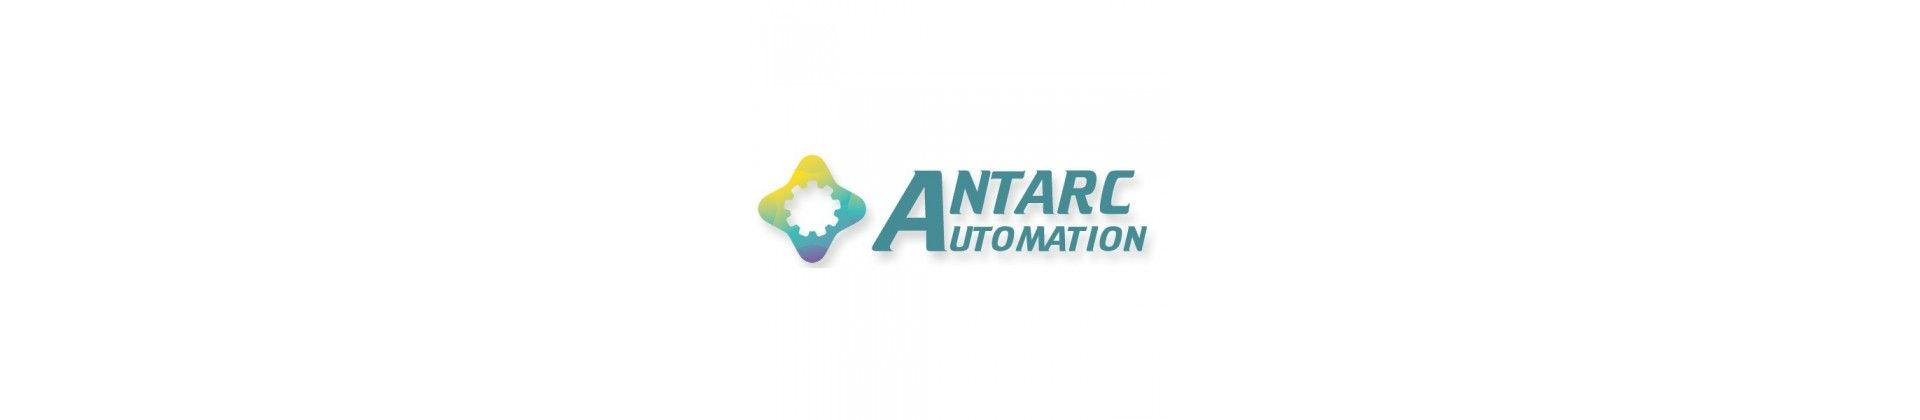 Antarc Automation